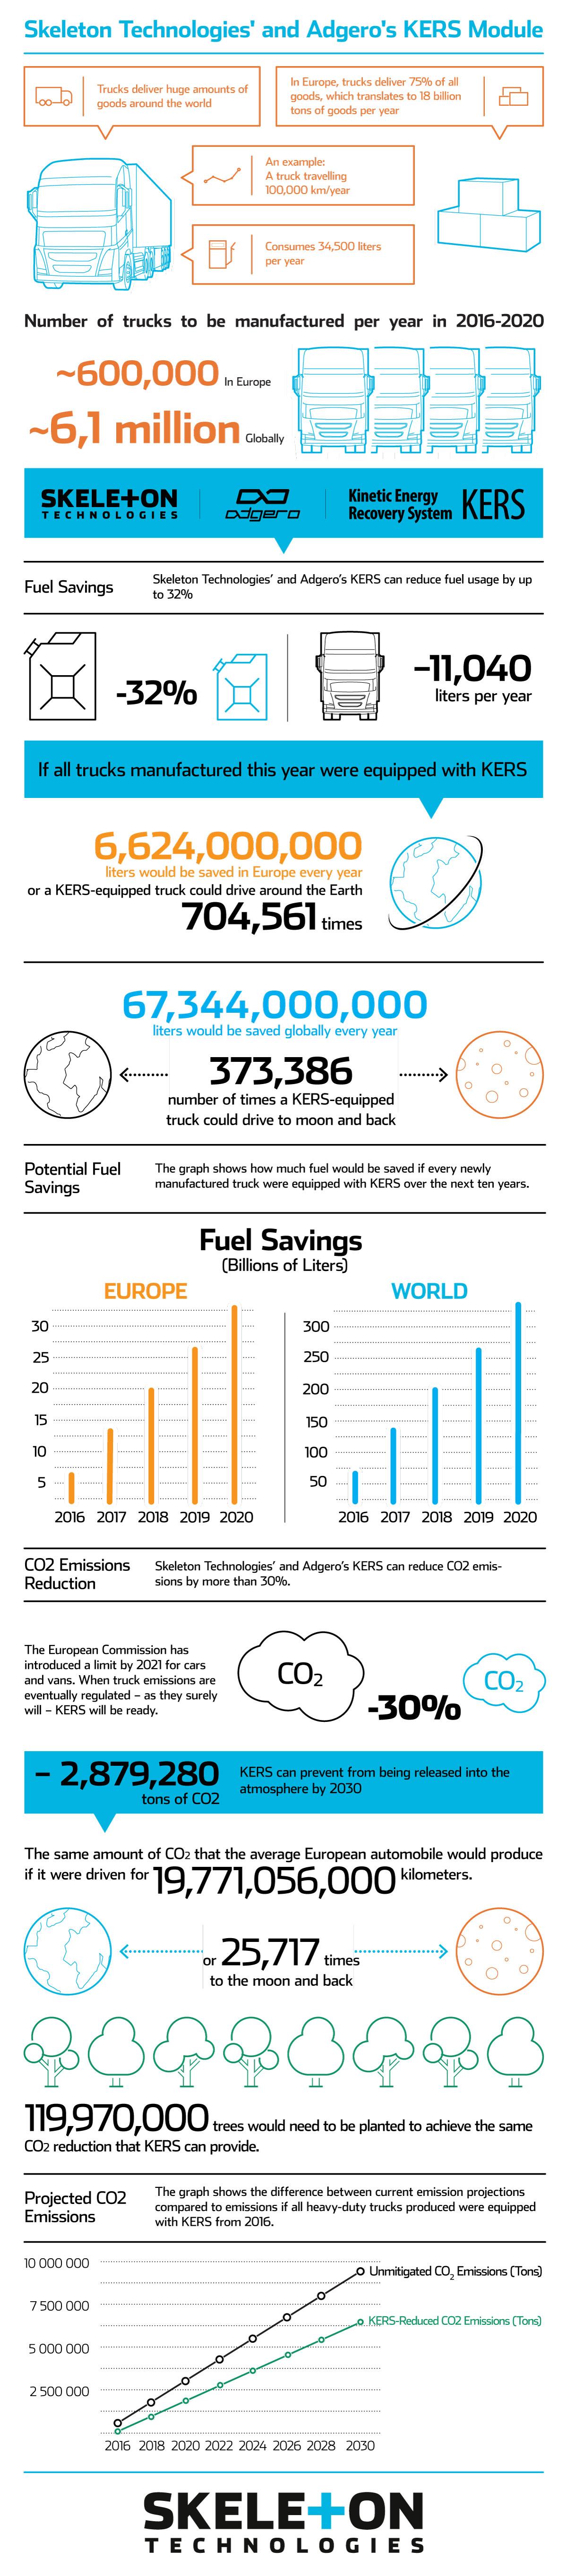 180723-IG_Fuel_Savings_world-hubspot